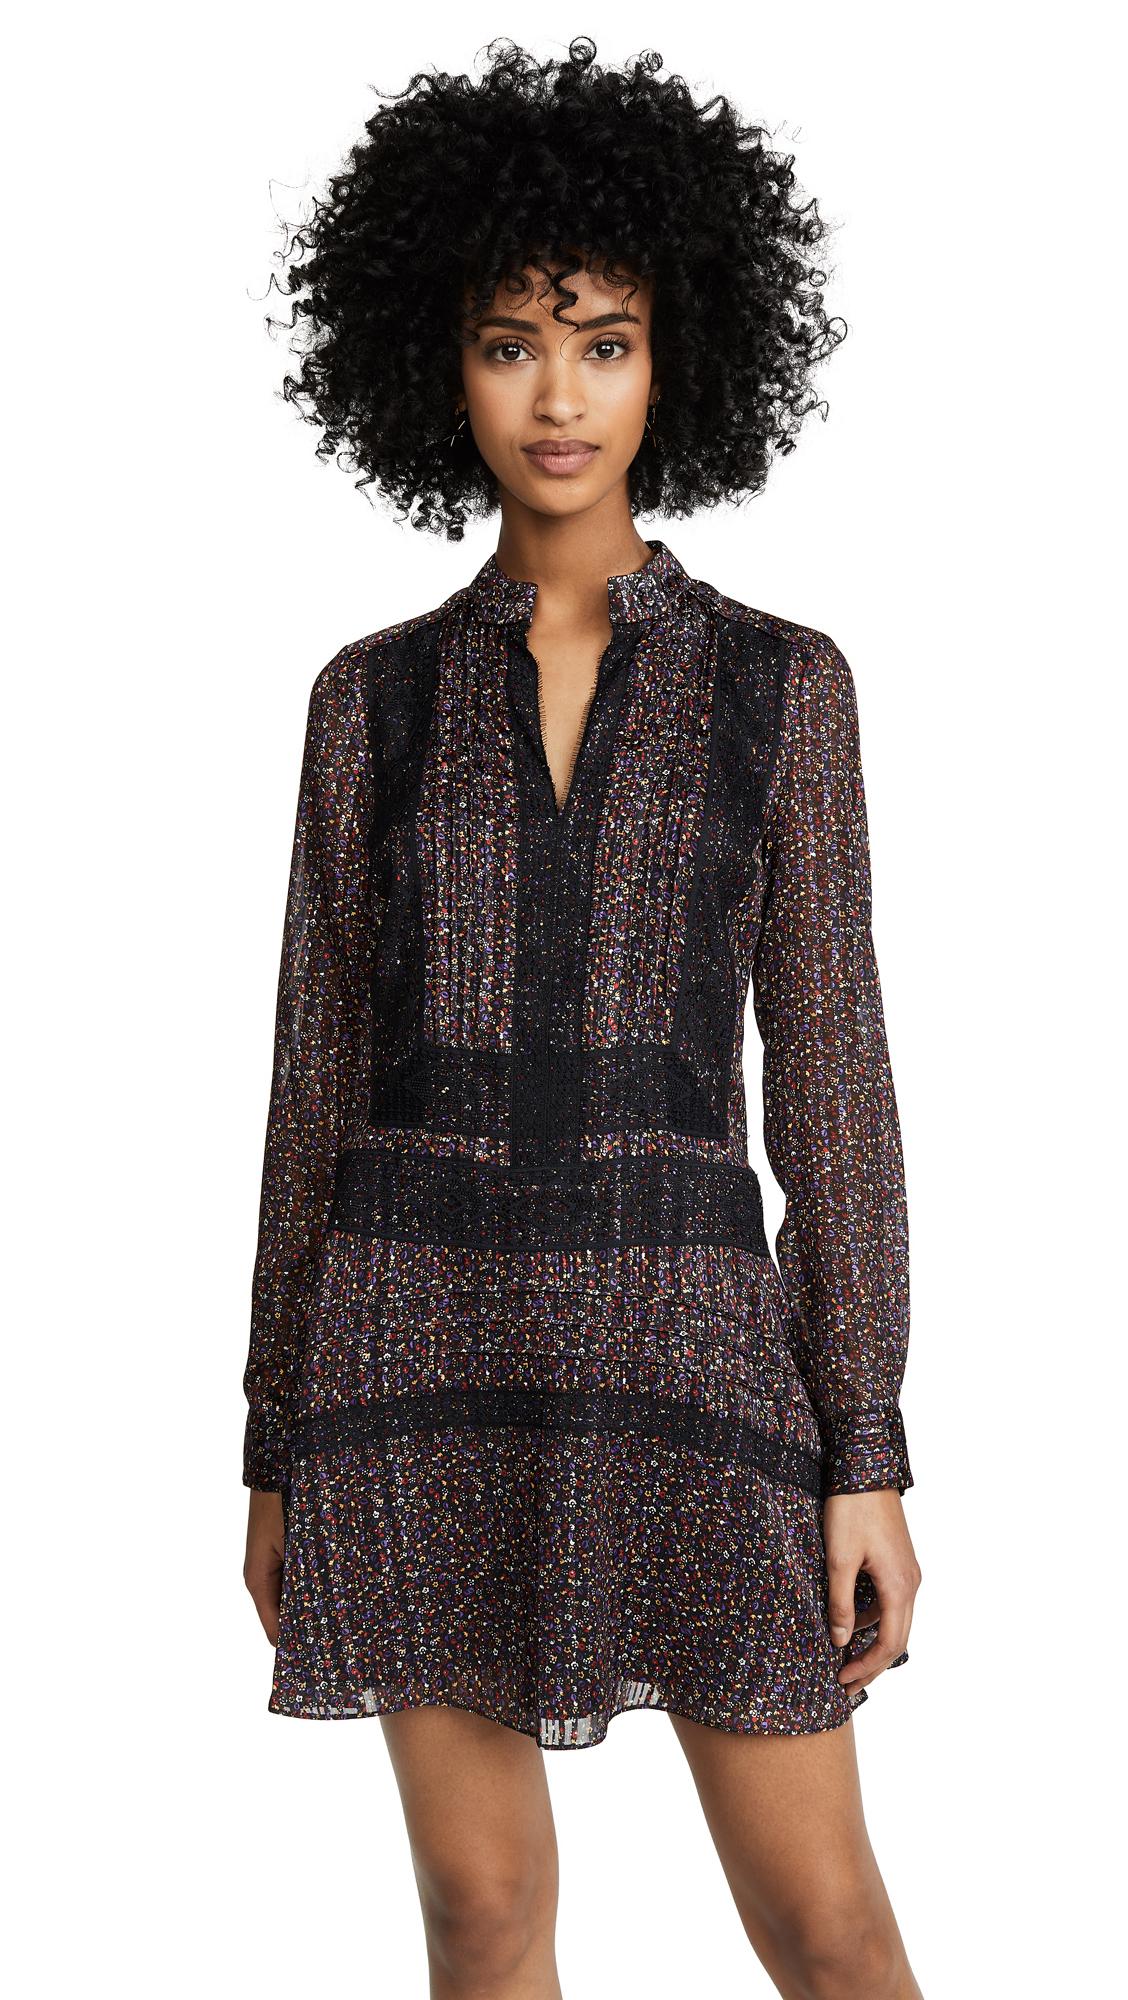 Derek Lam 10 Crosby Shift Dress with Lace Detail - Black